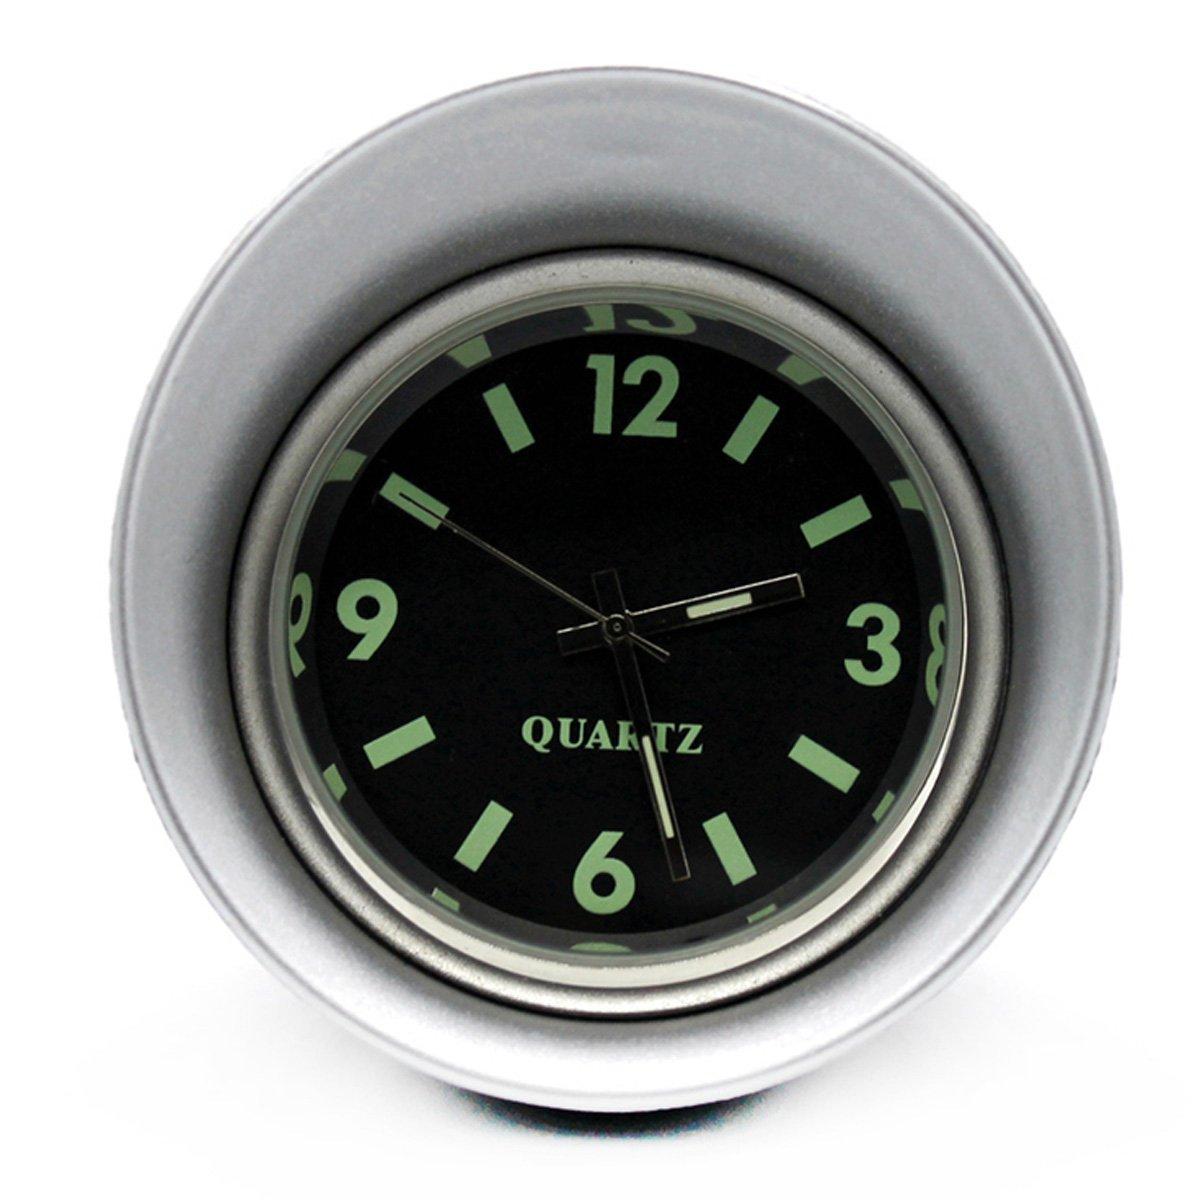 OLSUS Mini Car Quartz Watch with Black Backlight